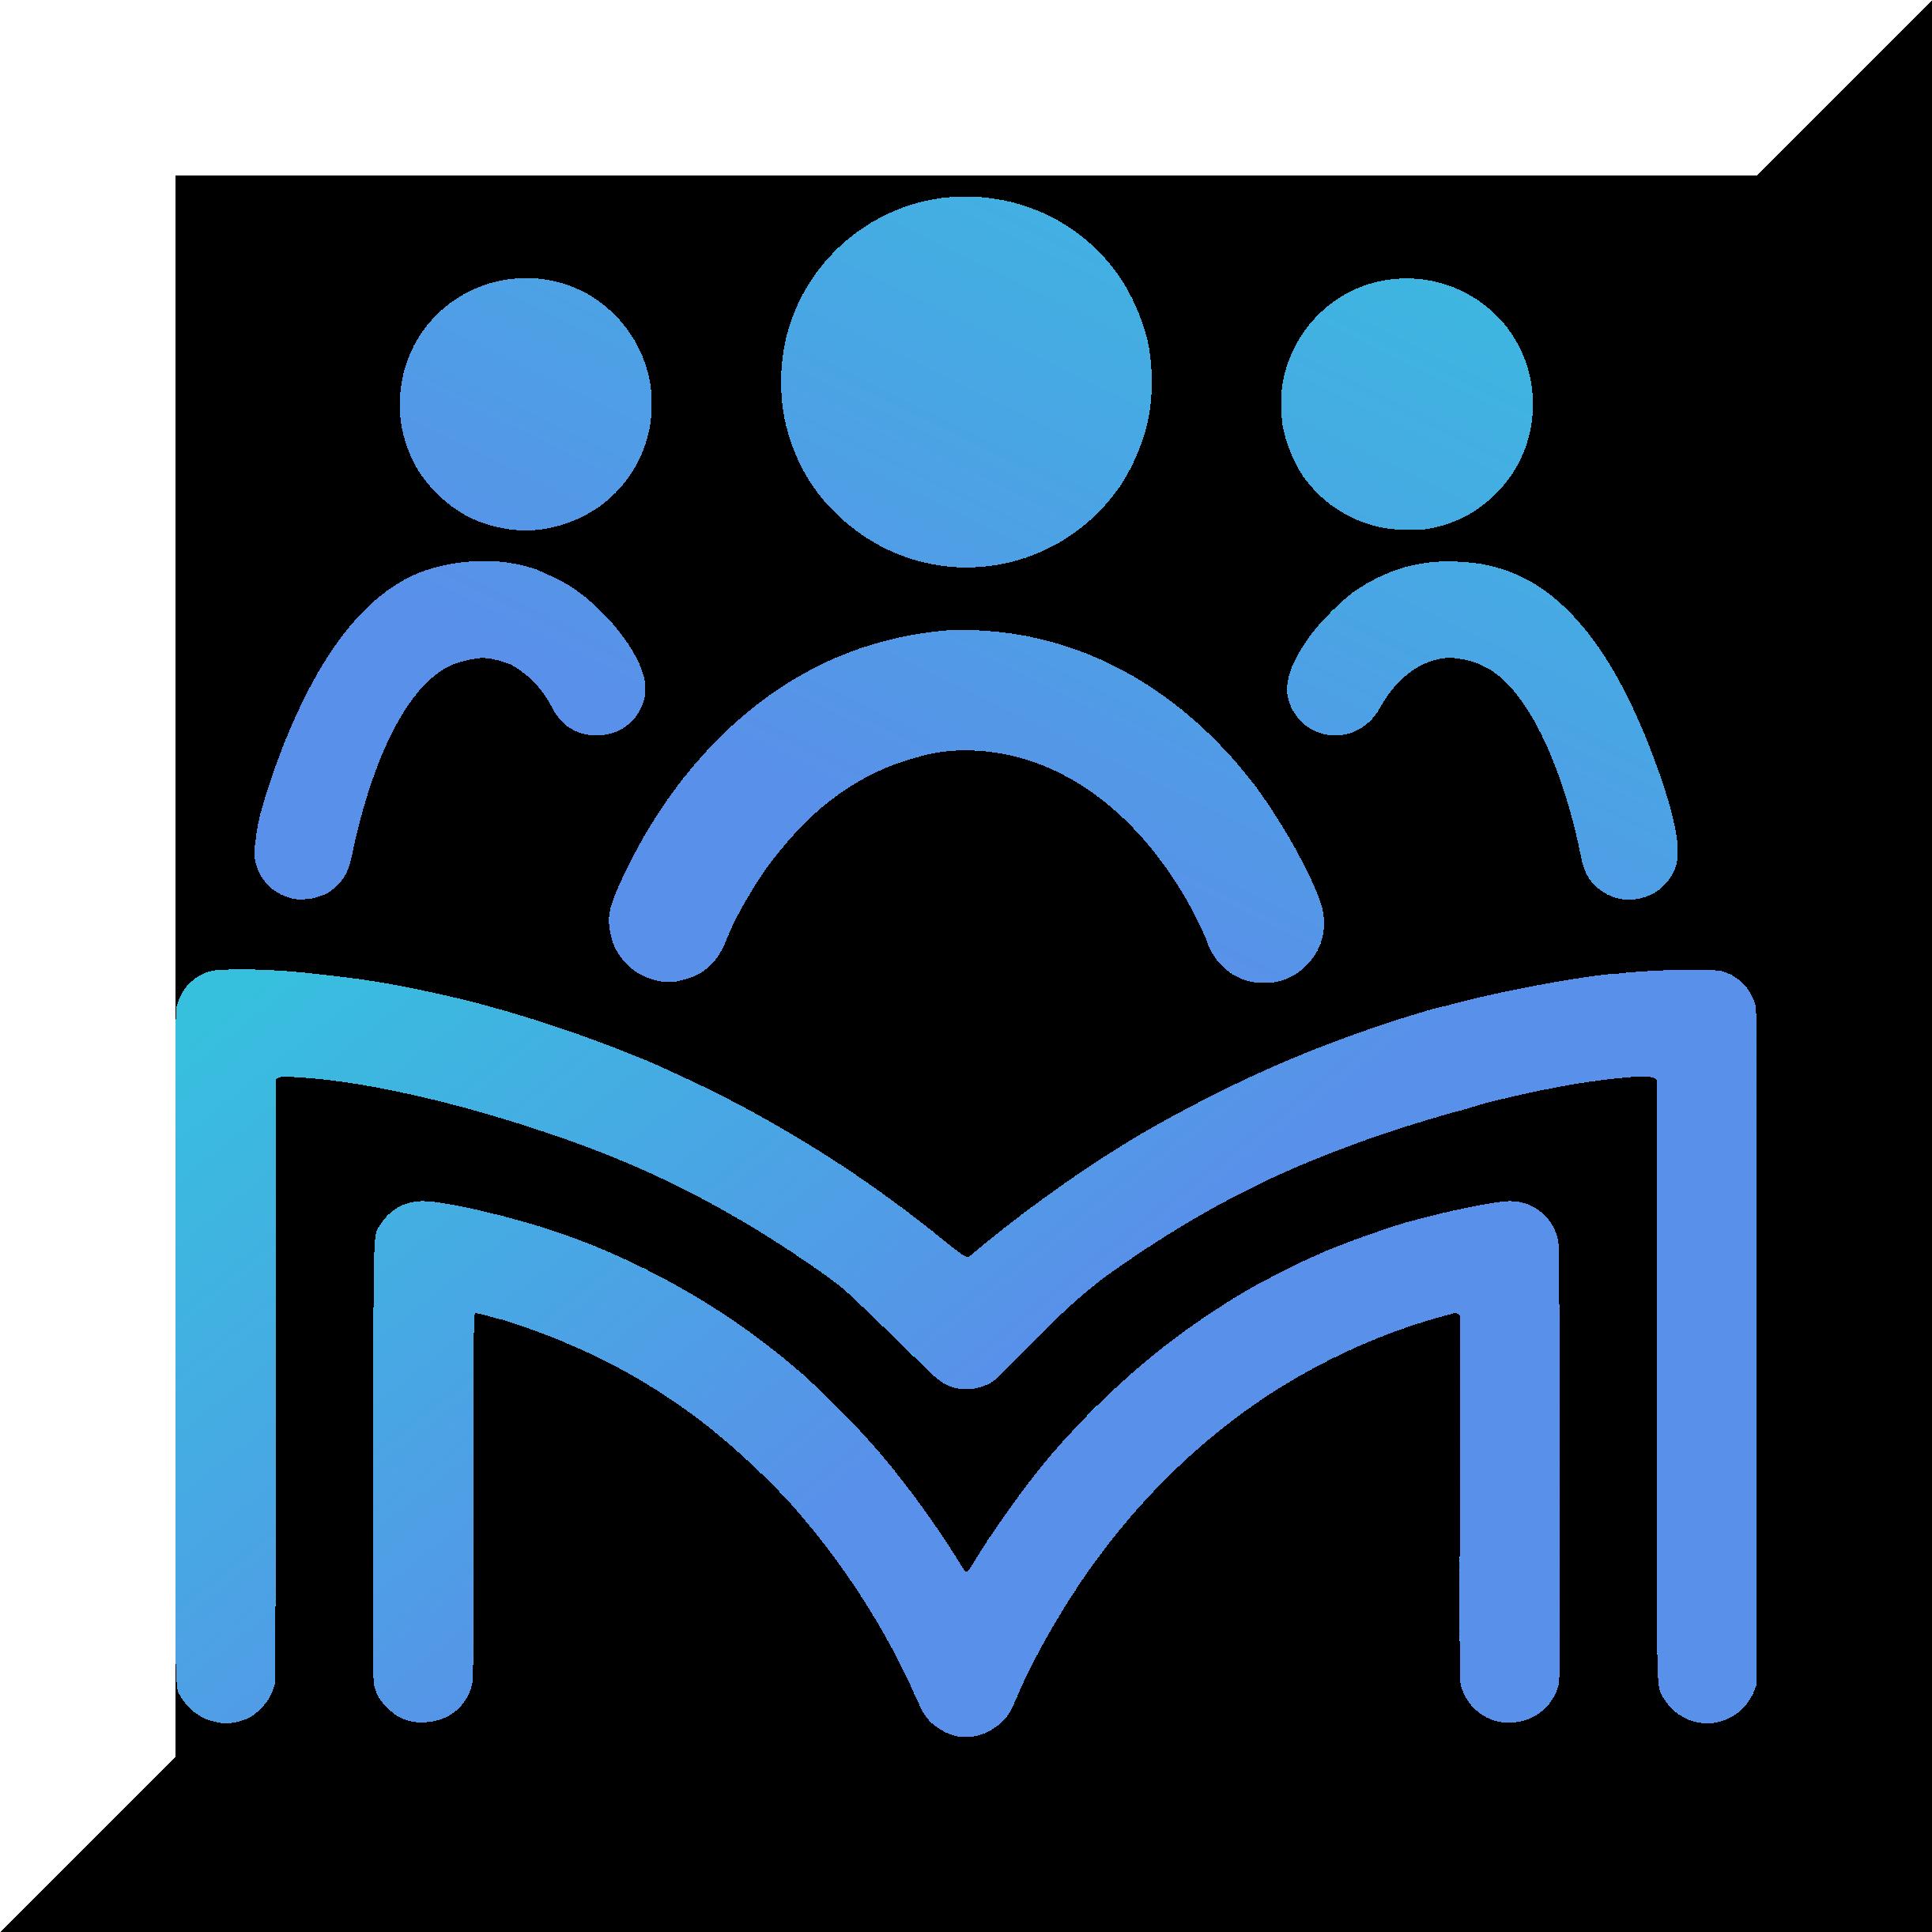 Logo Förderverein Schulcampus Hedelfingen